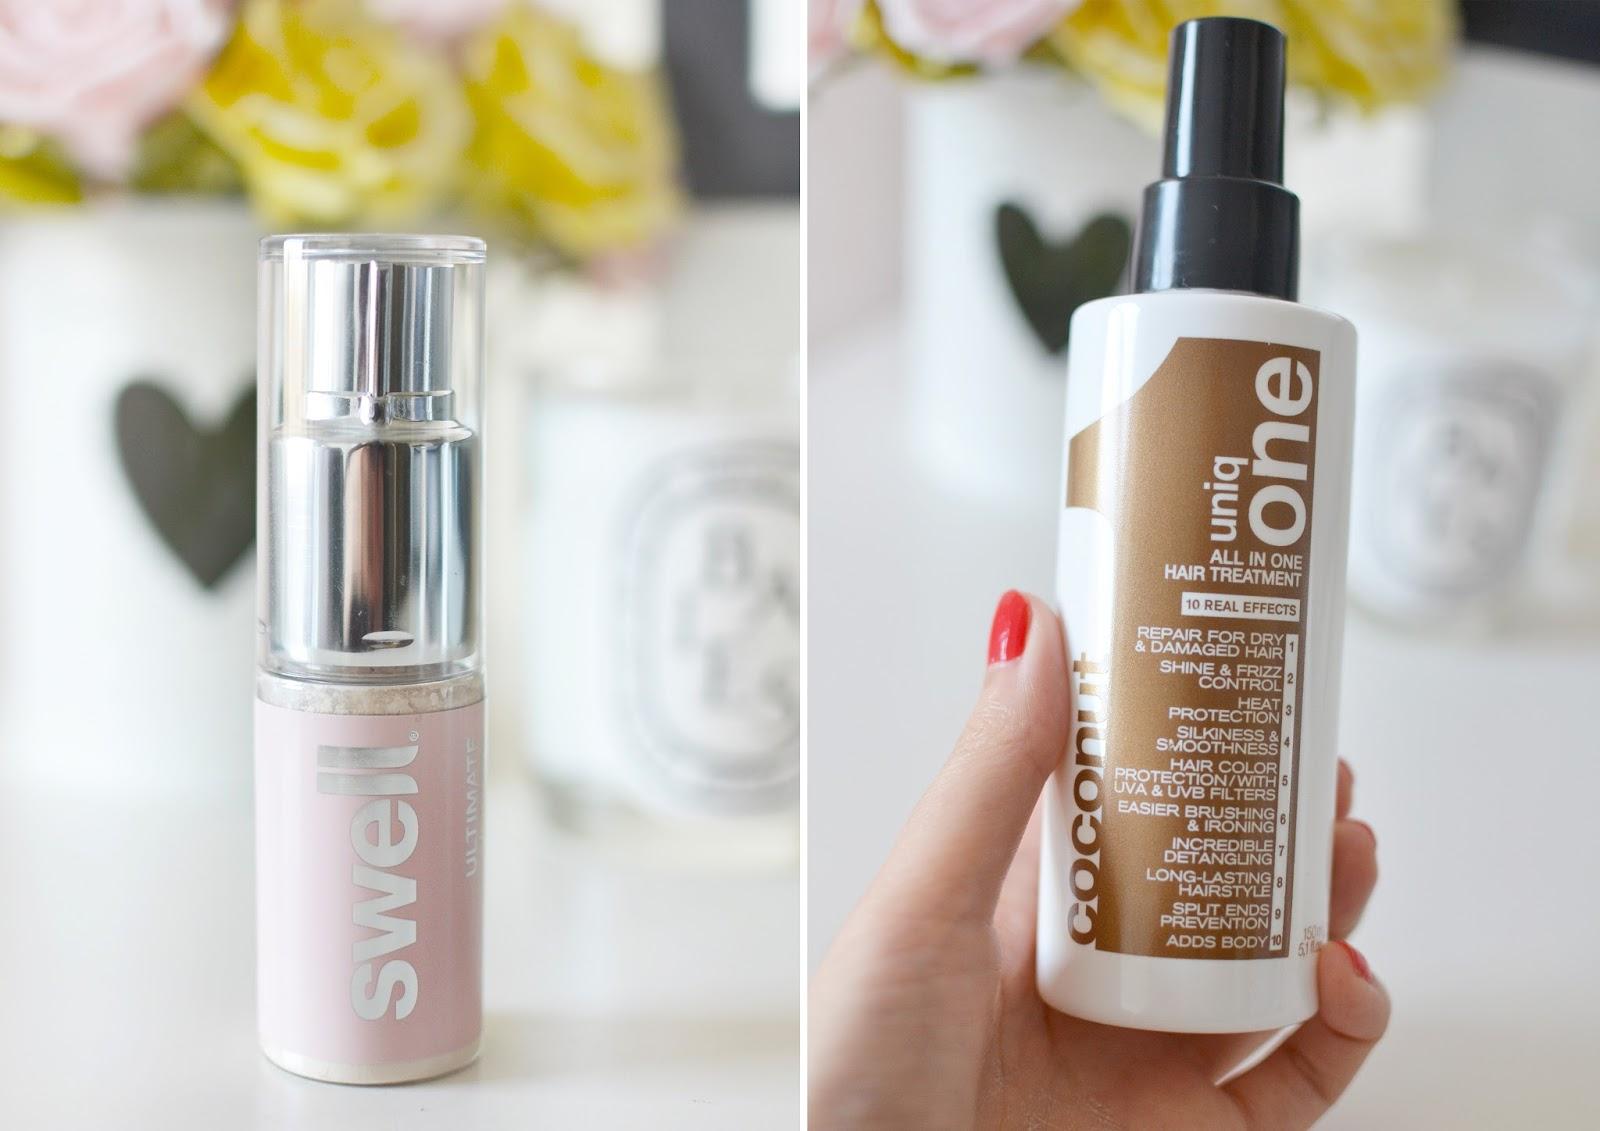 hair products, swell dry shampoo, uniqone coconut